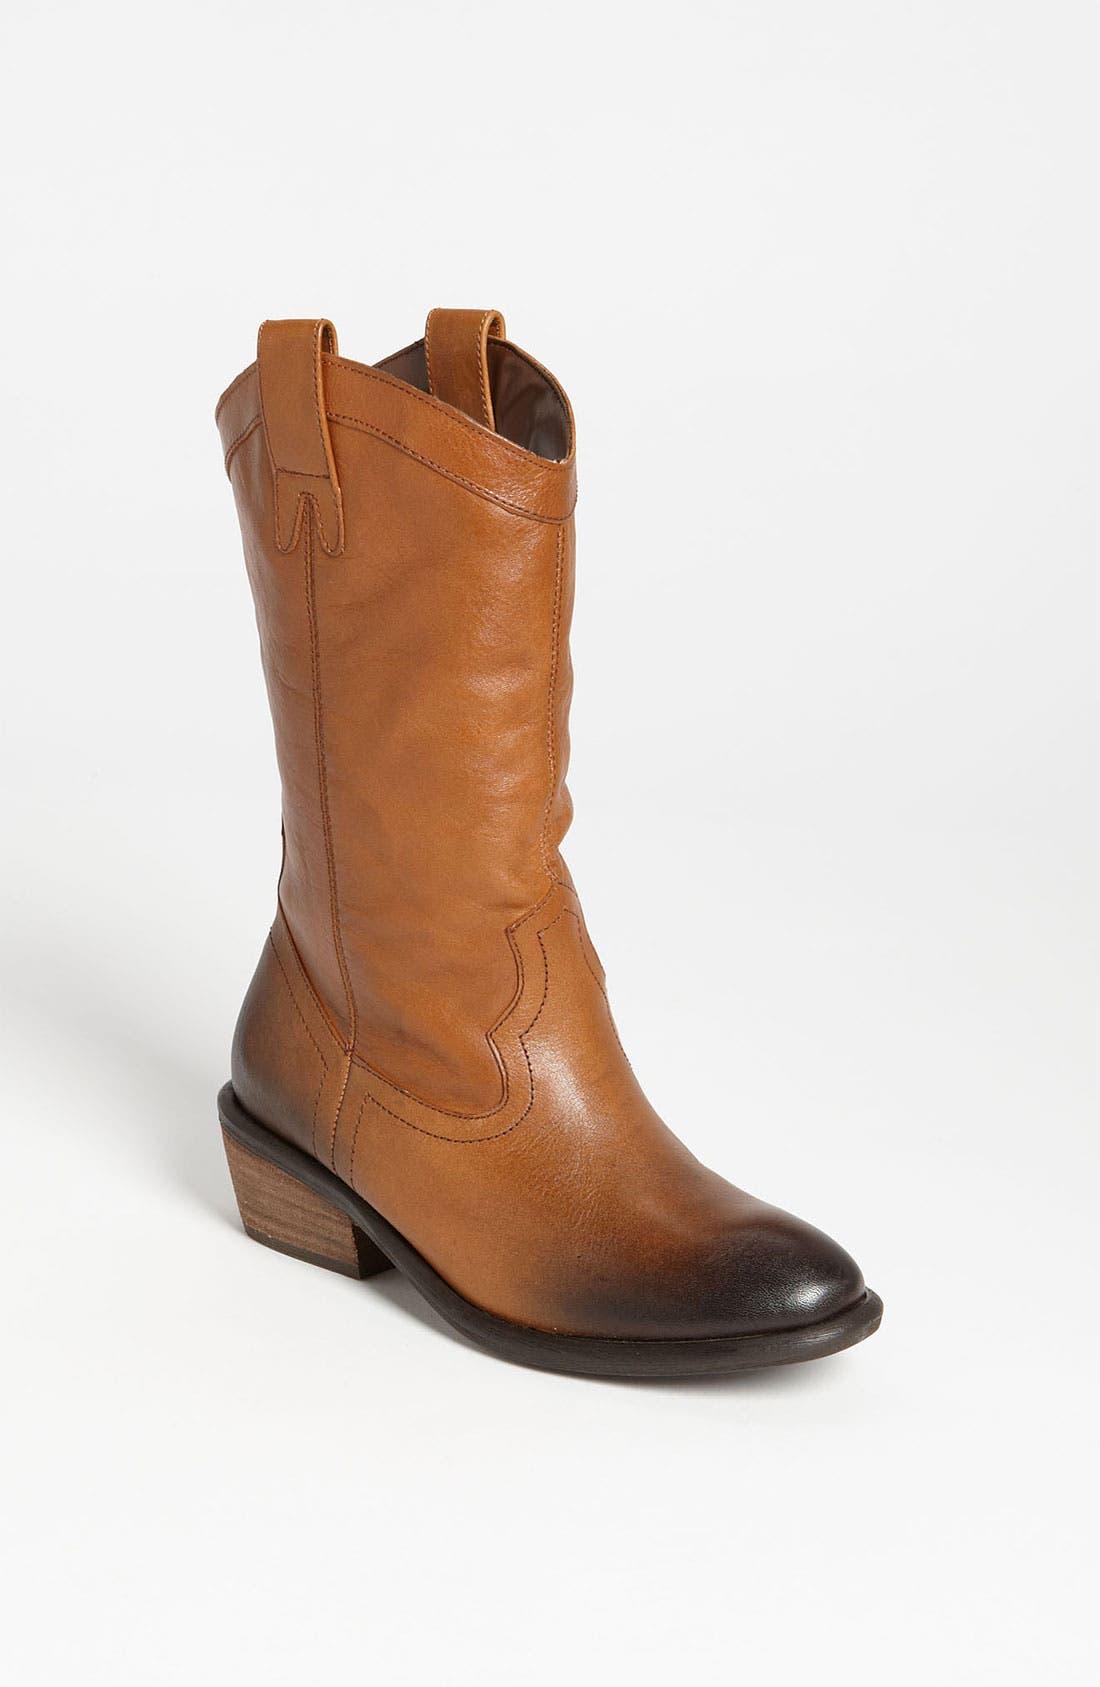 Alternate Image 1 Selected - Jessica Simpson 'Rosanna' Boot